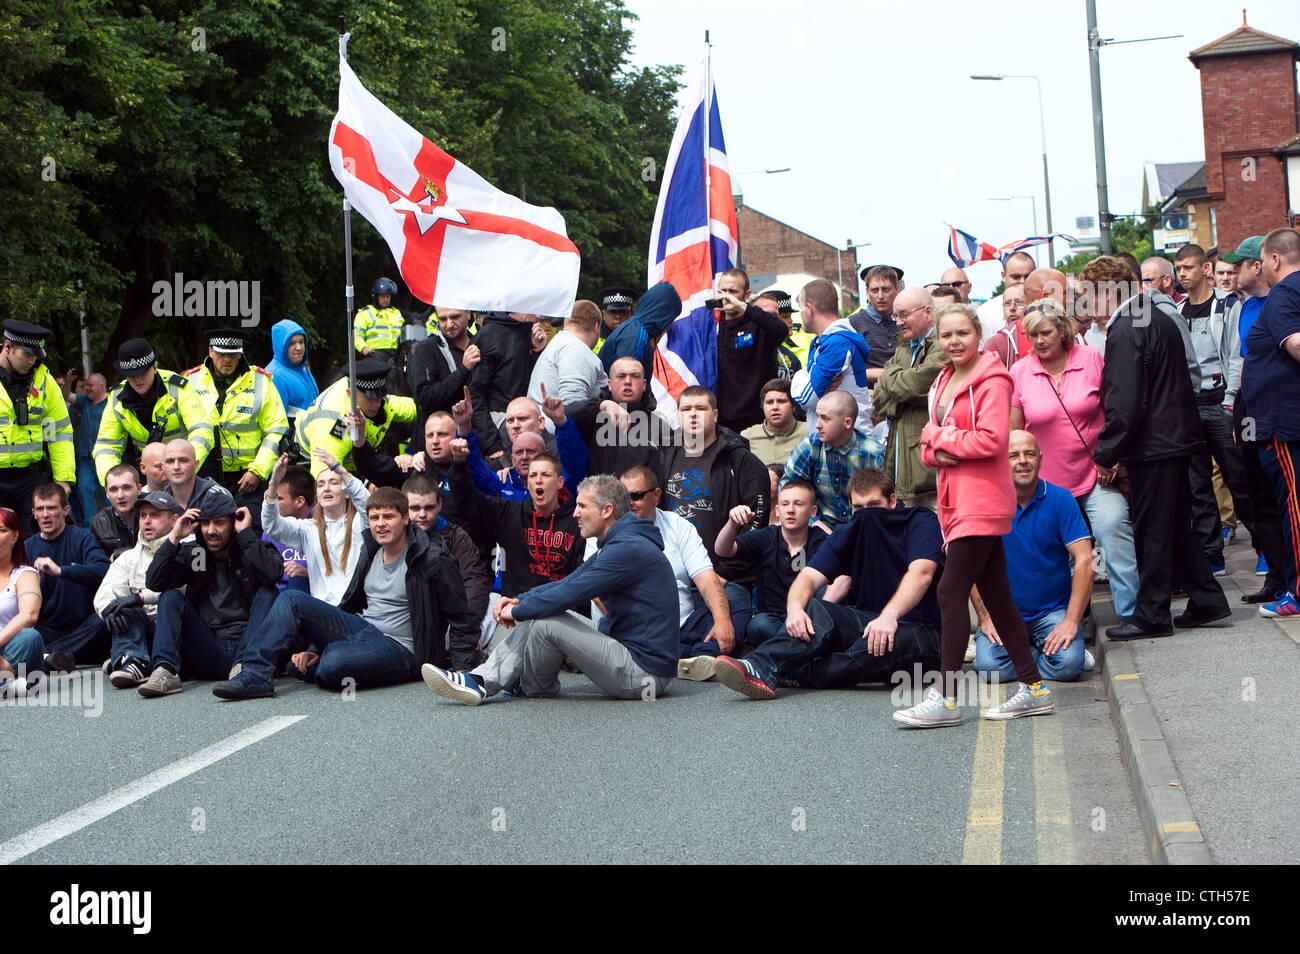 Extrême droite: une protestation s'asseoir au Park Road. James Larkin Society of Liverpool, Mars Photo Stock